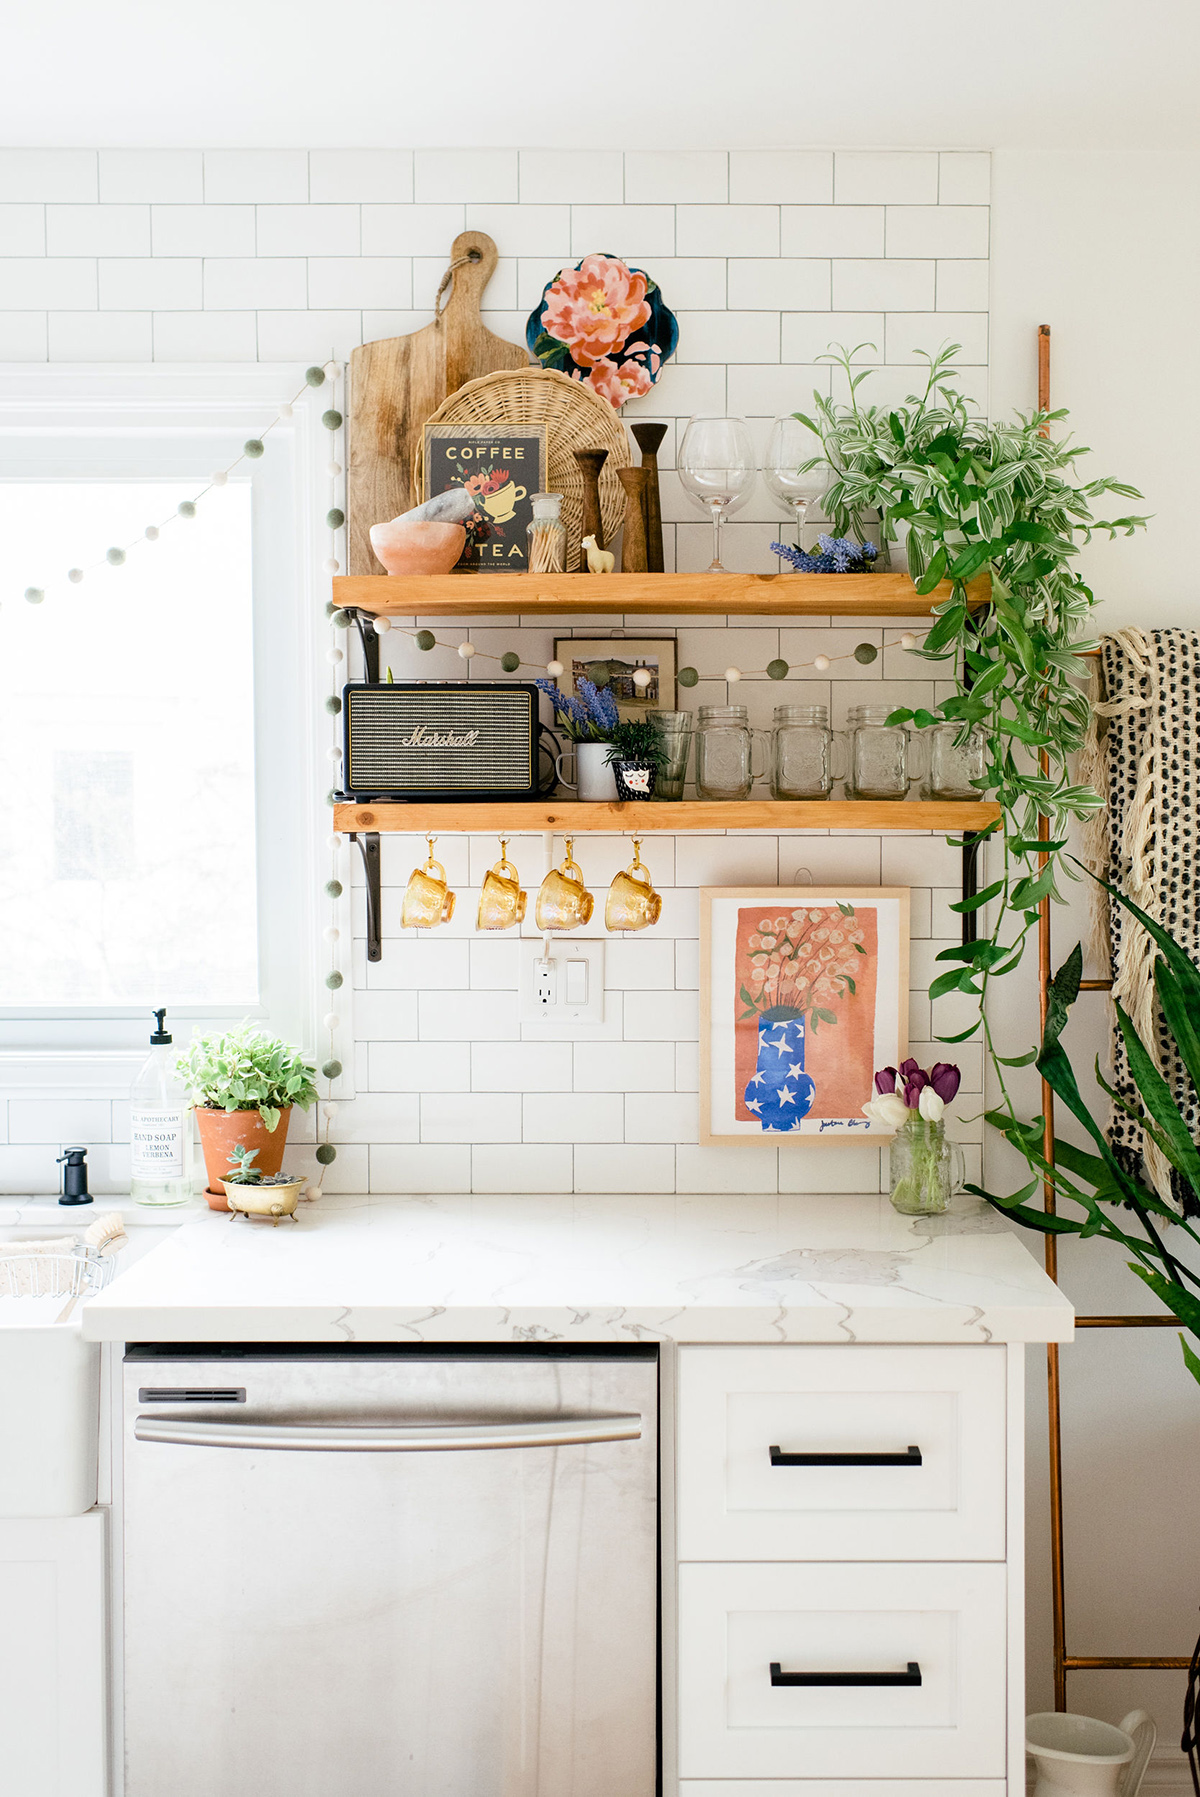 #thekwendyhome kitchen